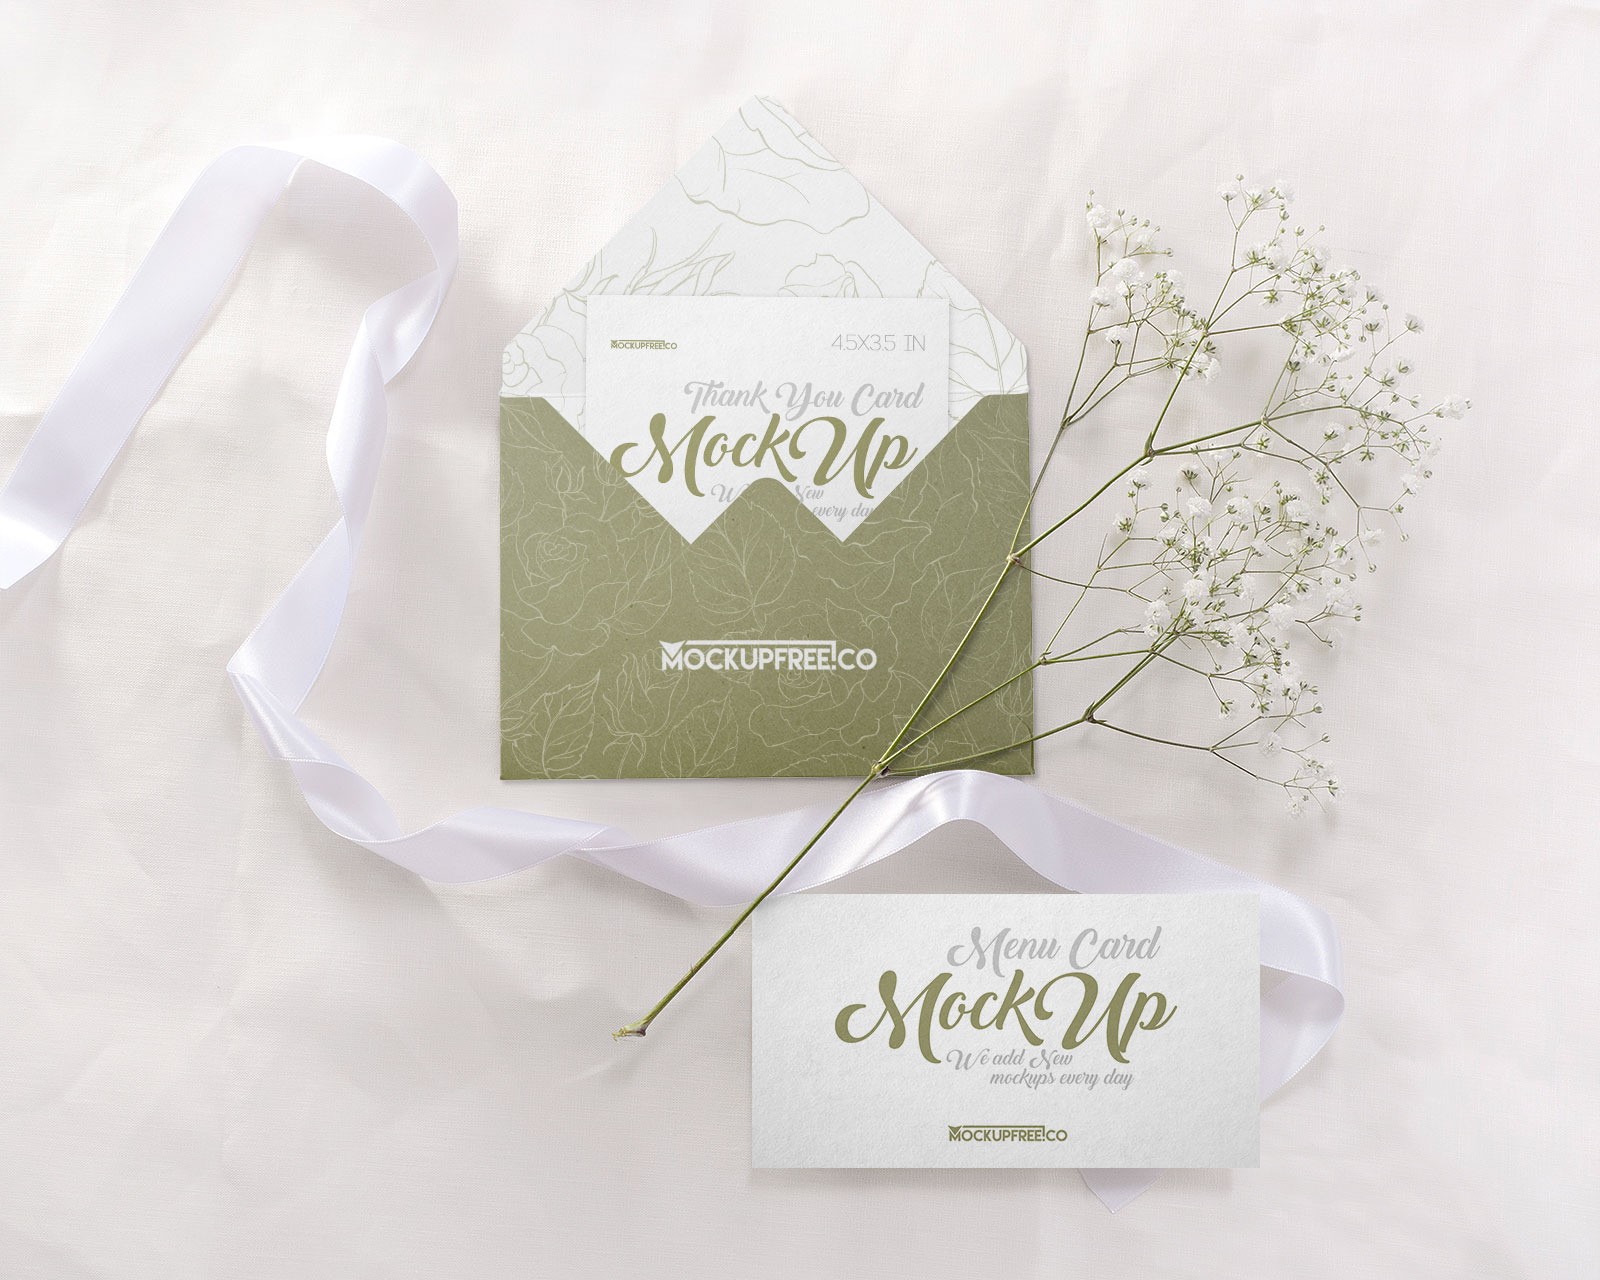 Free wedding invitation card mockup psd set good mockups free wedding invitation card mockup psd set 3 stopboris Images